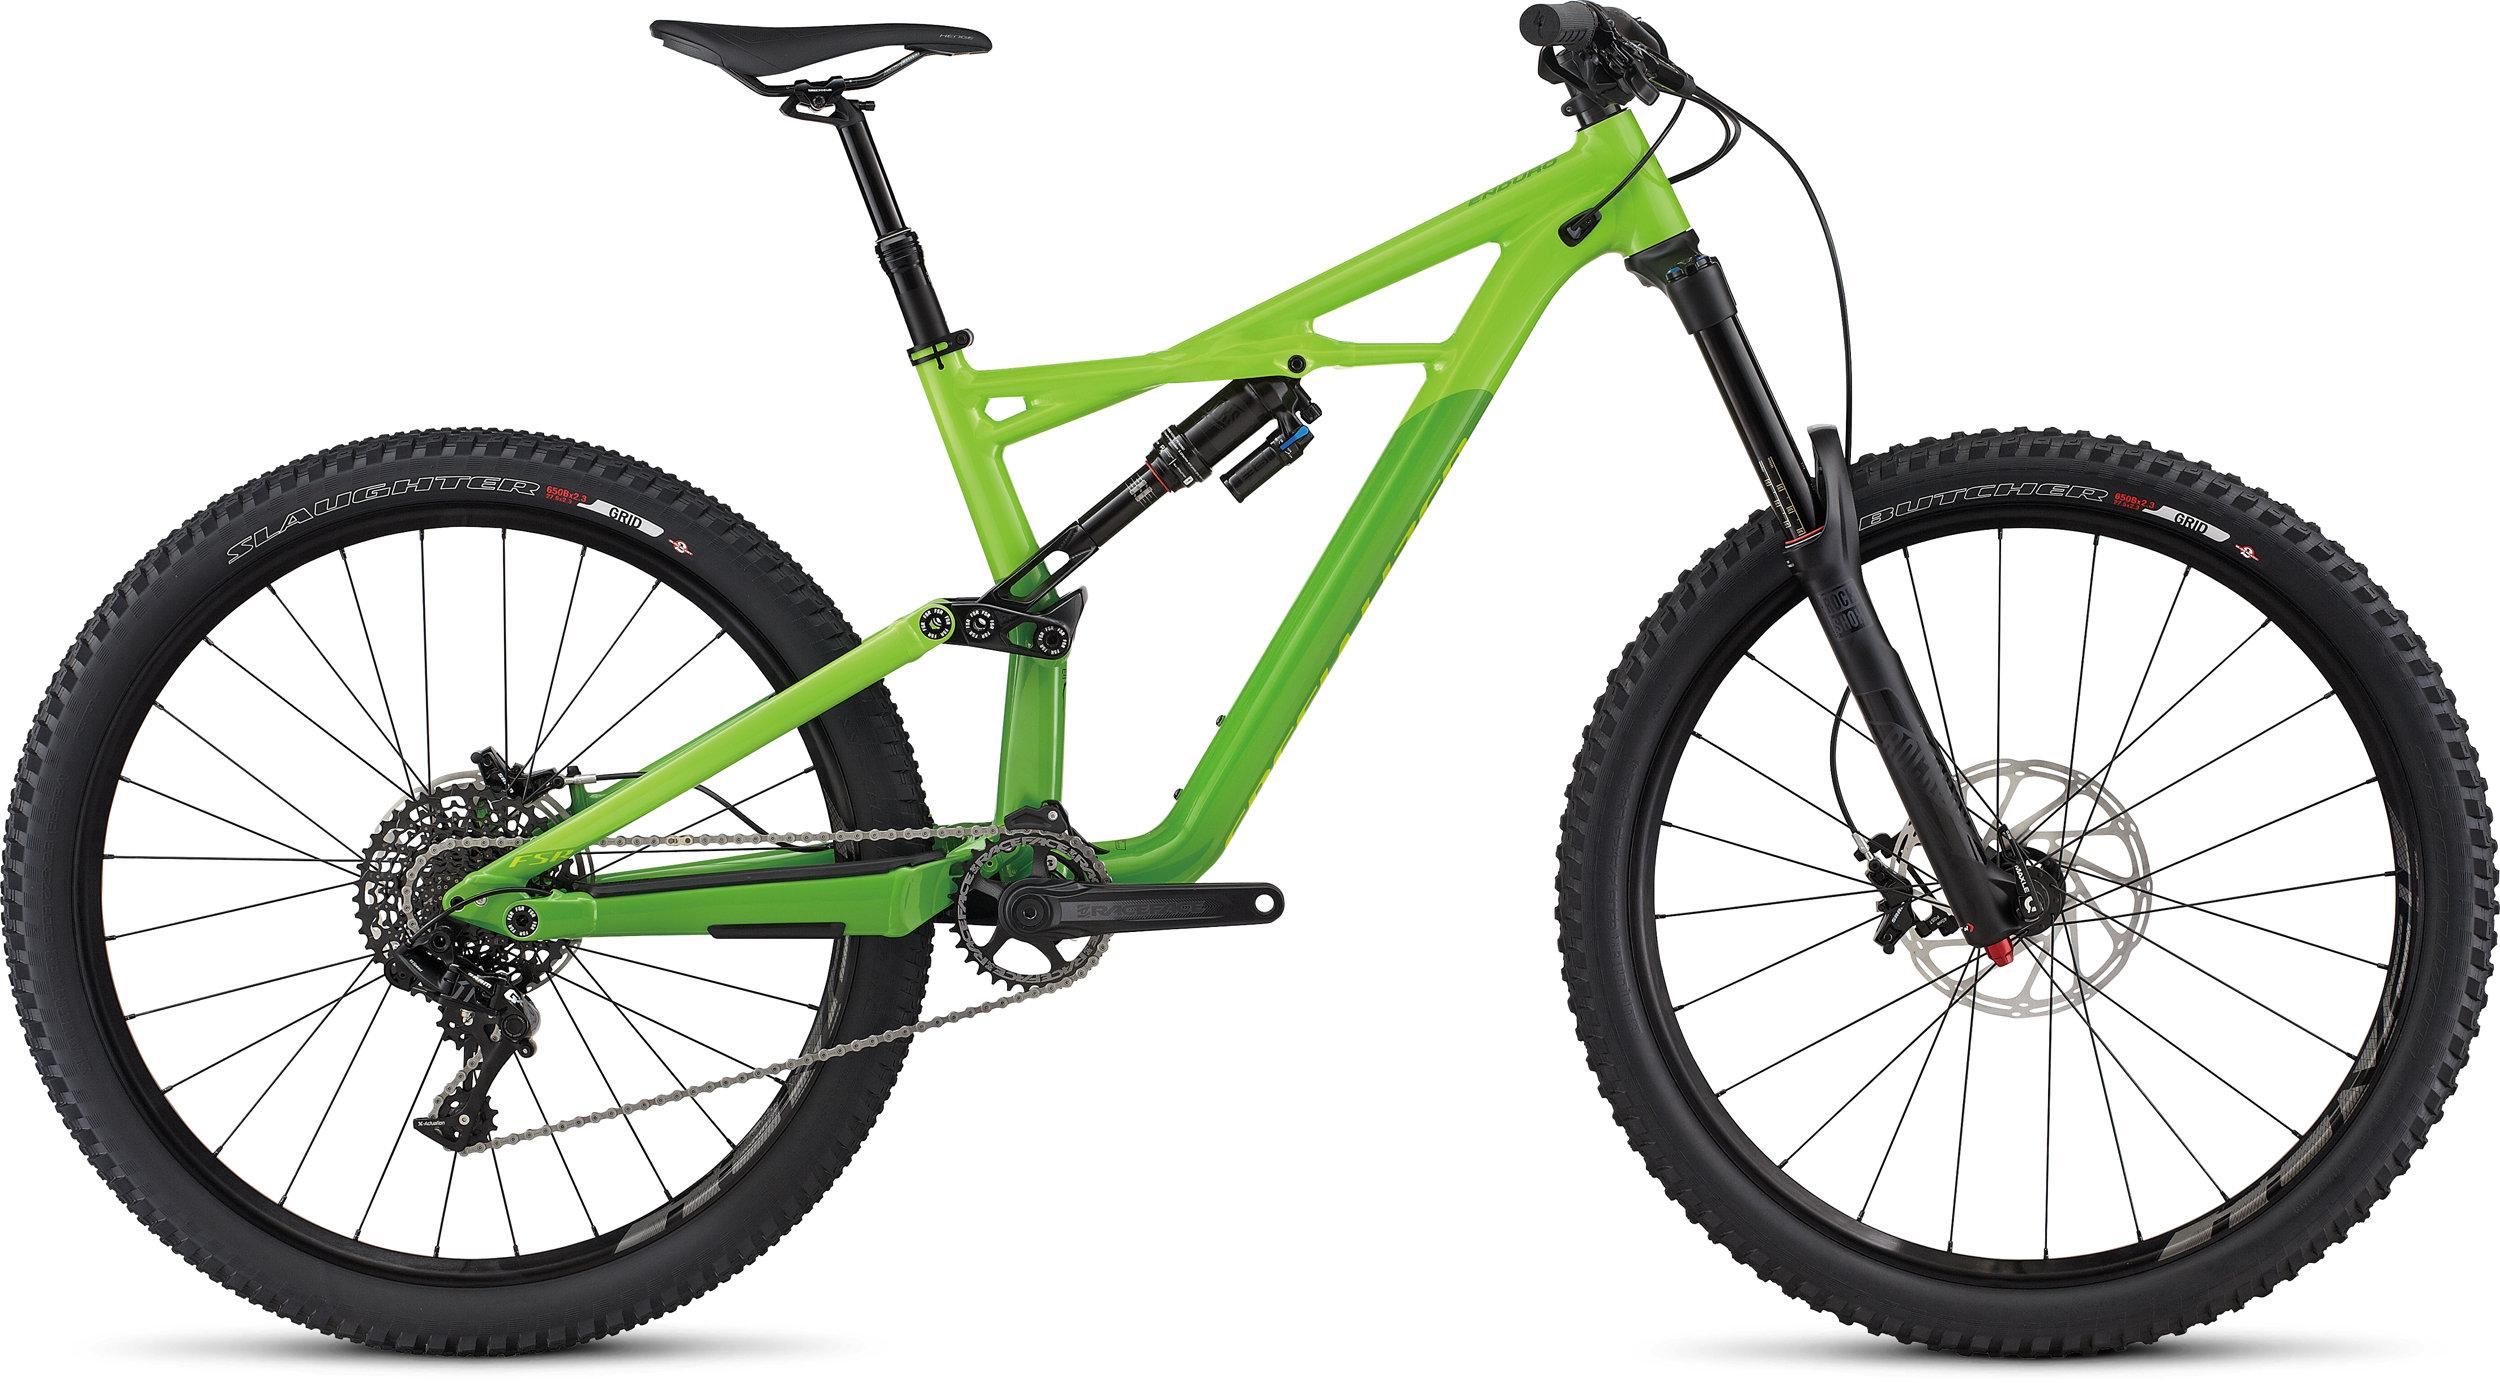 SPECIALIZED ENDURO FSR COMP 650B MXGRN/MONGRN/HYP L - Alpha Bikes